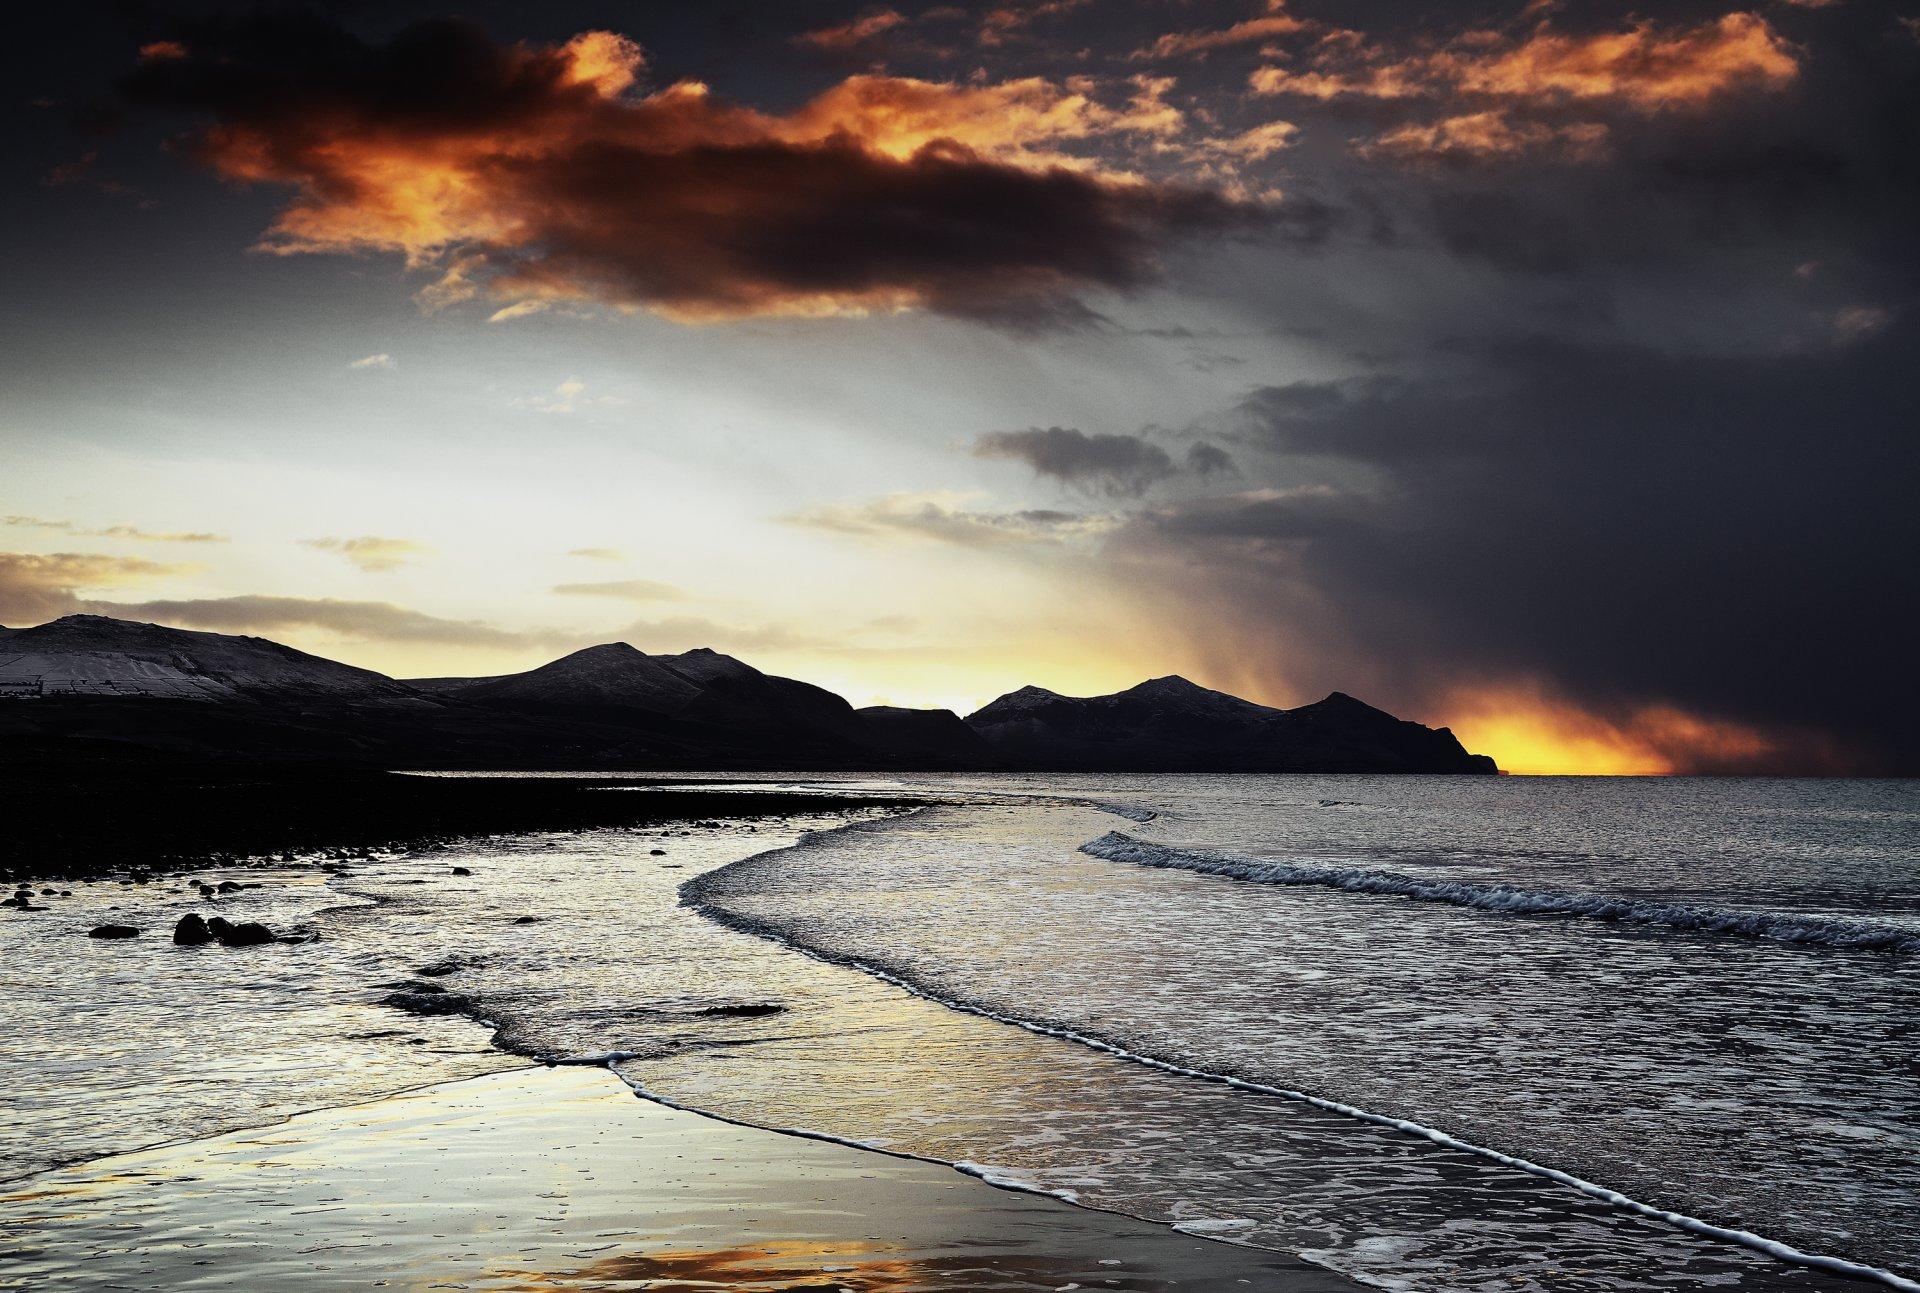 Картинки моря фото, поздравления